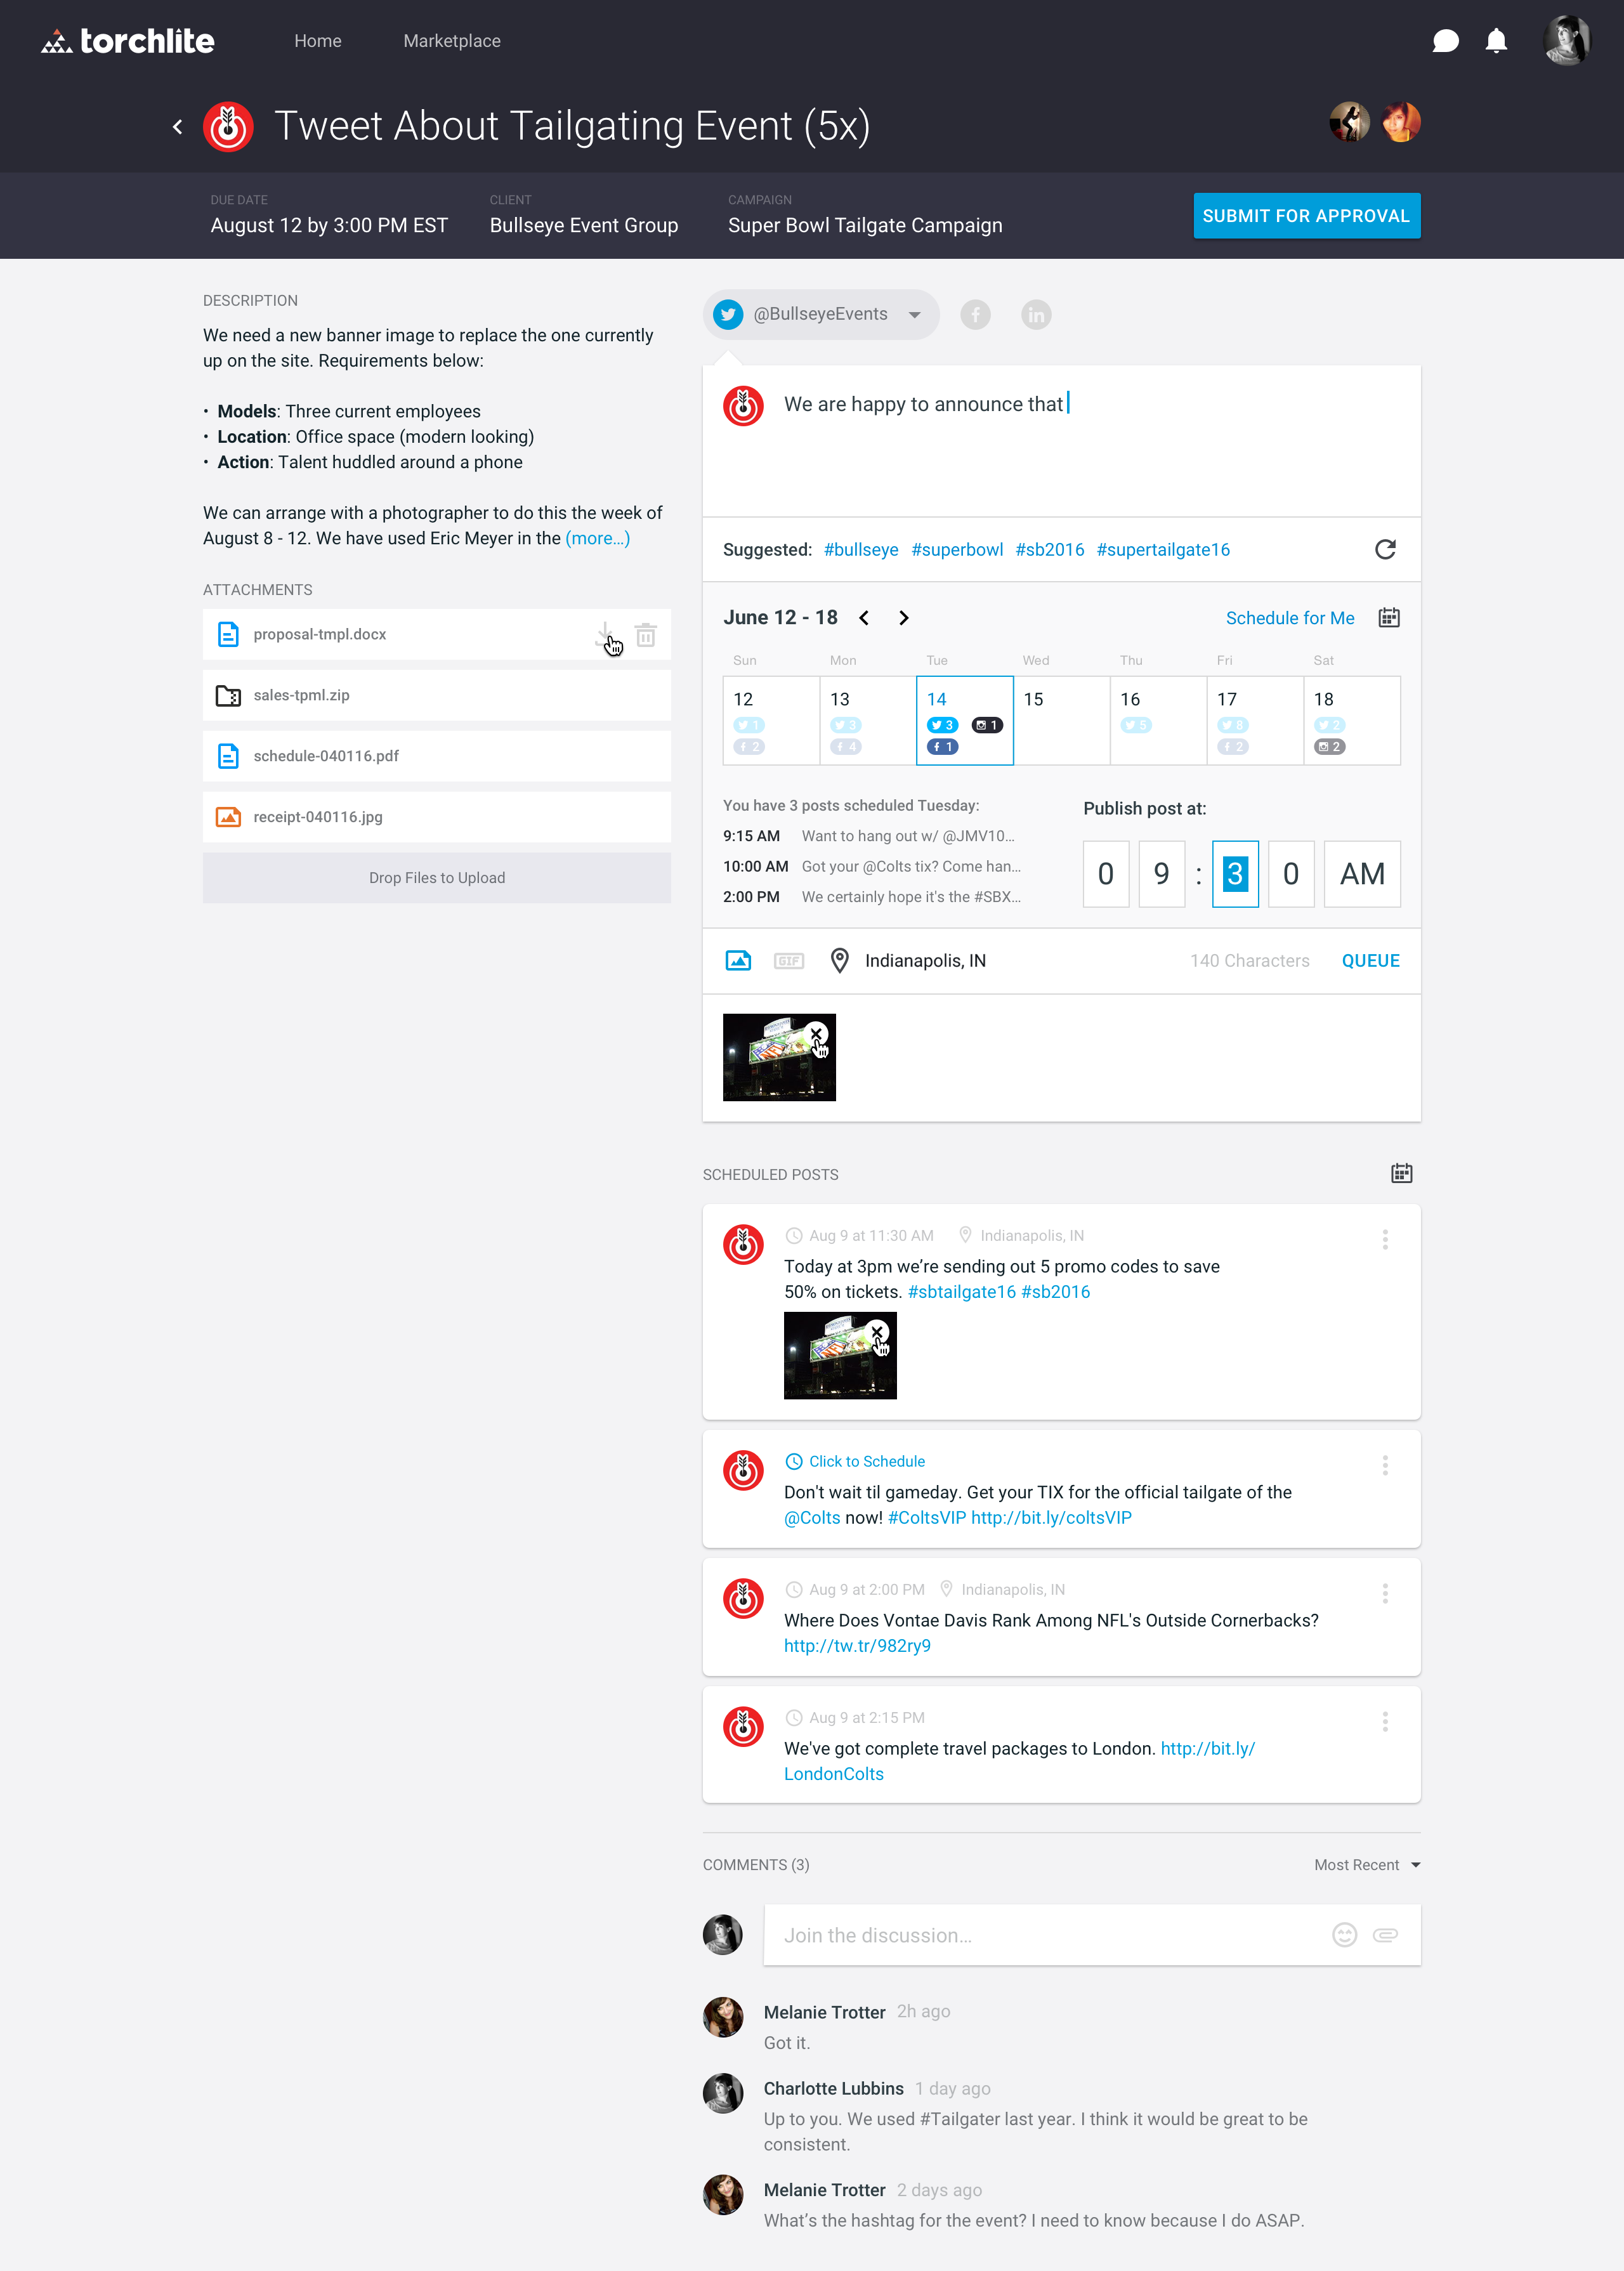 Social scheduling in the Torchlite platform